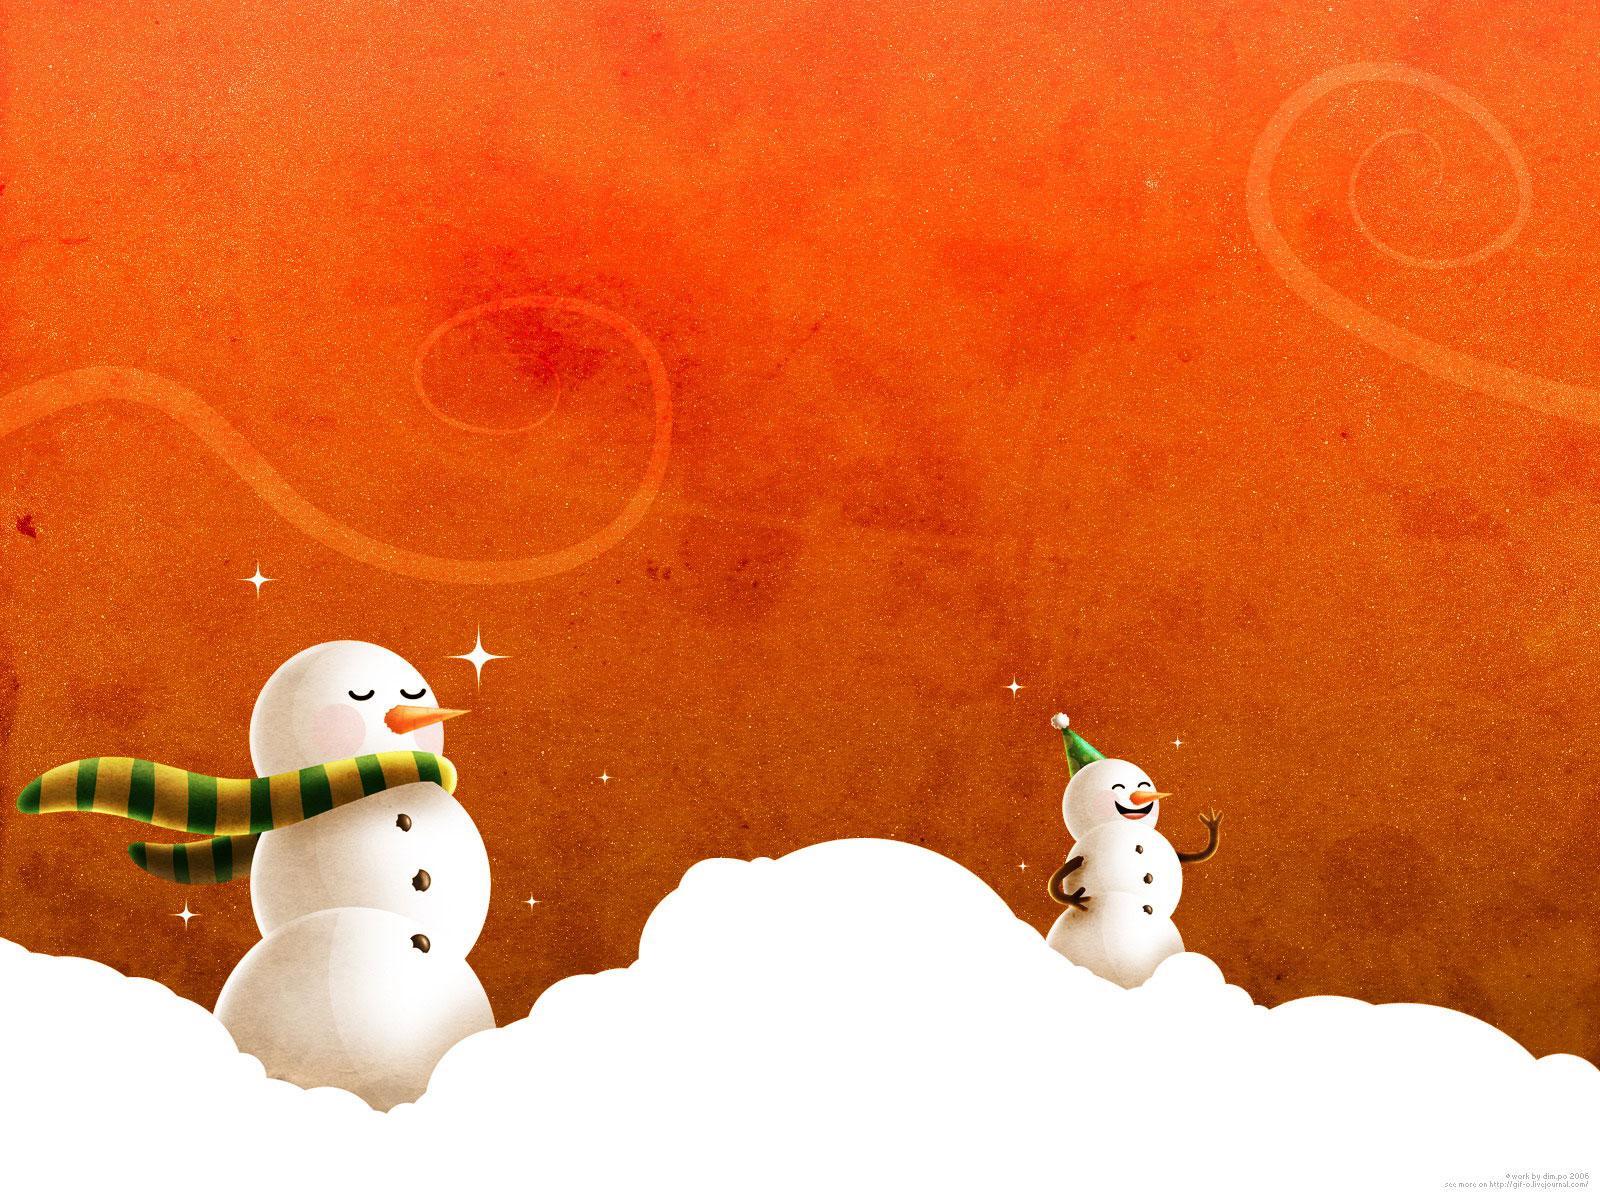 Christmas Wallpaper 2 1600x1200